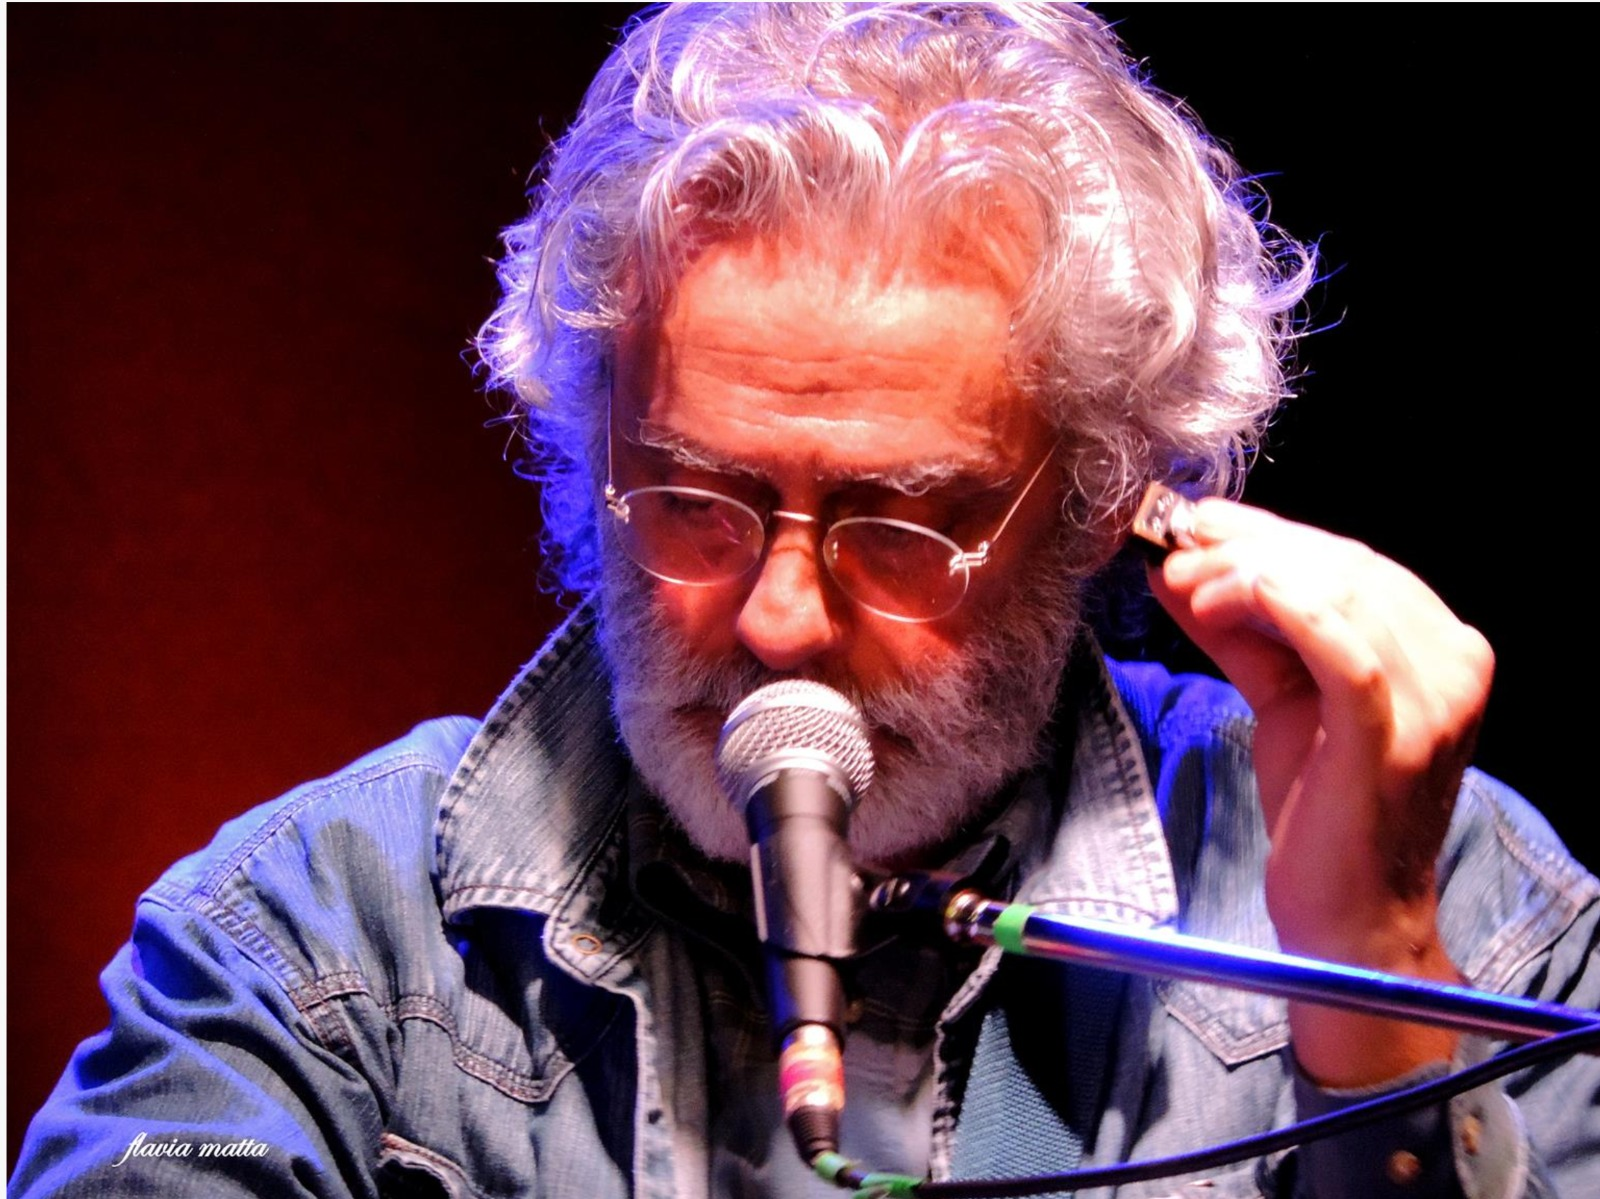 Franco Fois - The Mojo Workers - Fire - Talkin' Blues - Simone Murru - intervista - Sa Scena Sarda - 2020